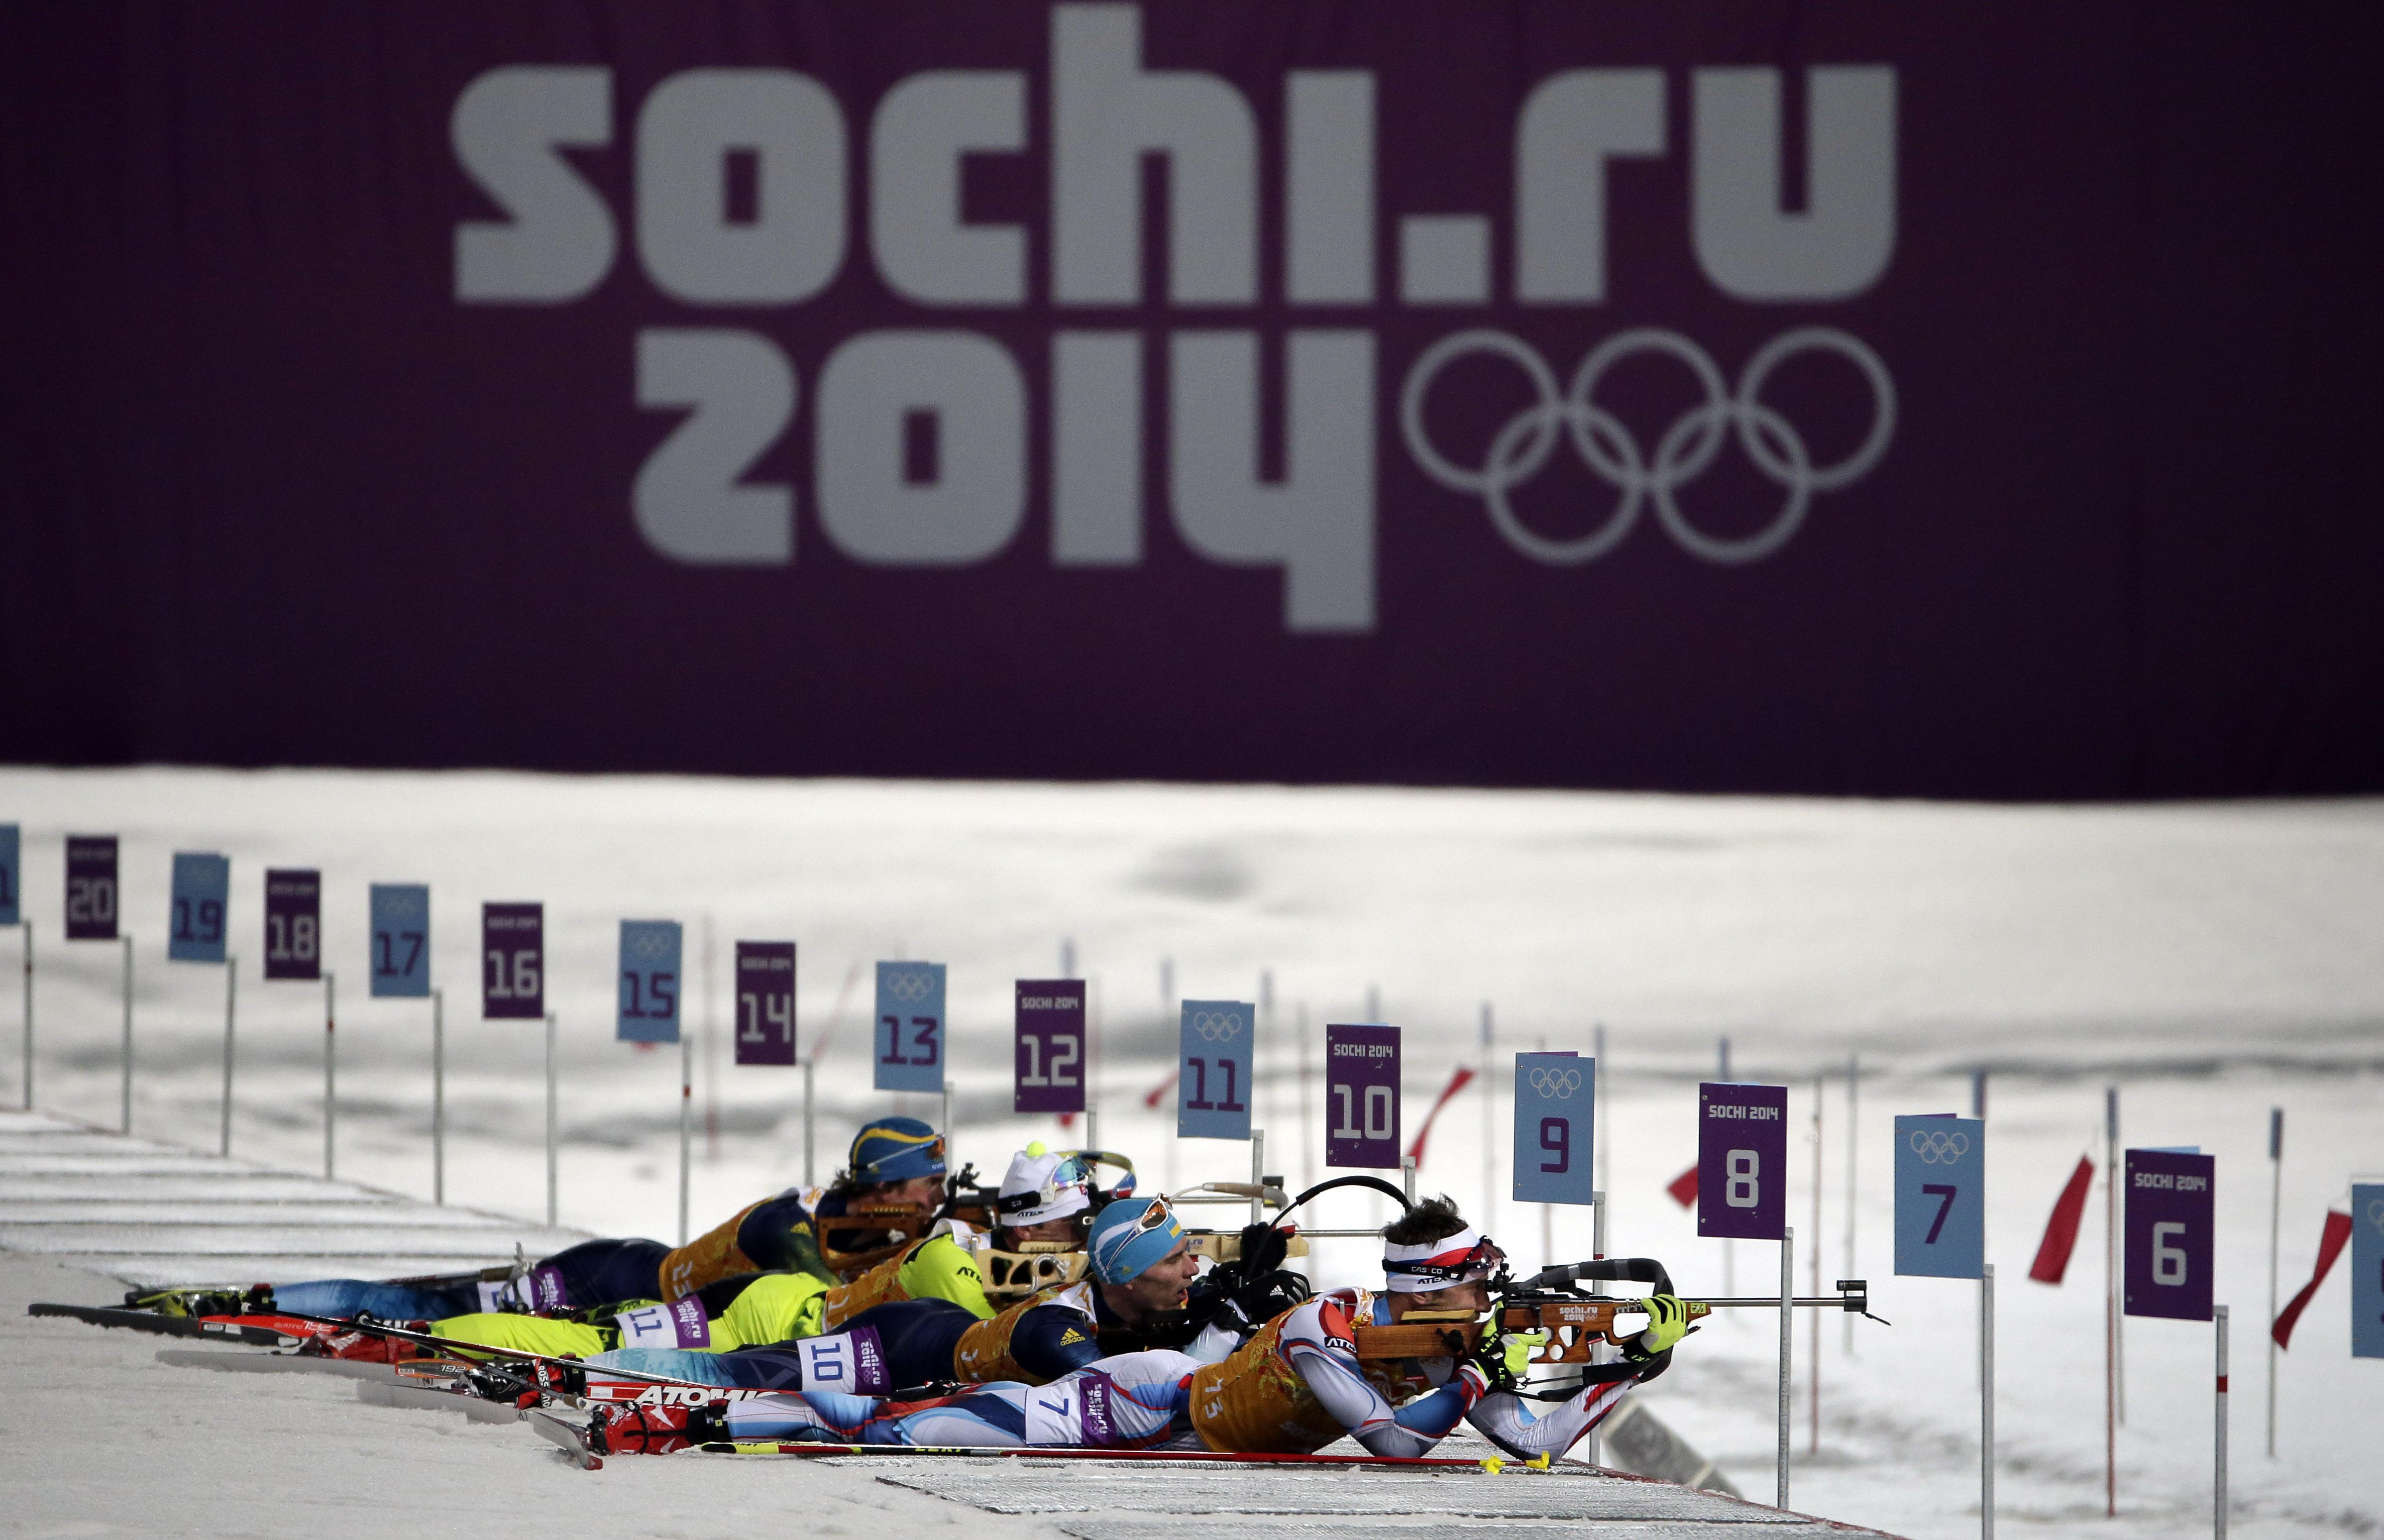 Competitors line up in the shooting range during the men's biathlon 4x7.5K relay at the 2014 Winter Olympics, Saturday, Feb. 22, 2014, in Krasnaya Polyana, Russia. (AP Photo/Felipe Dana)